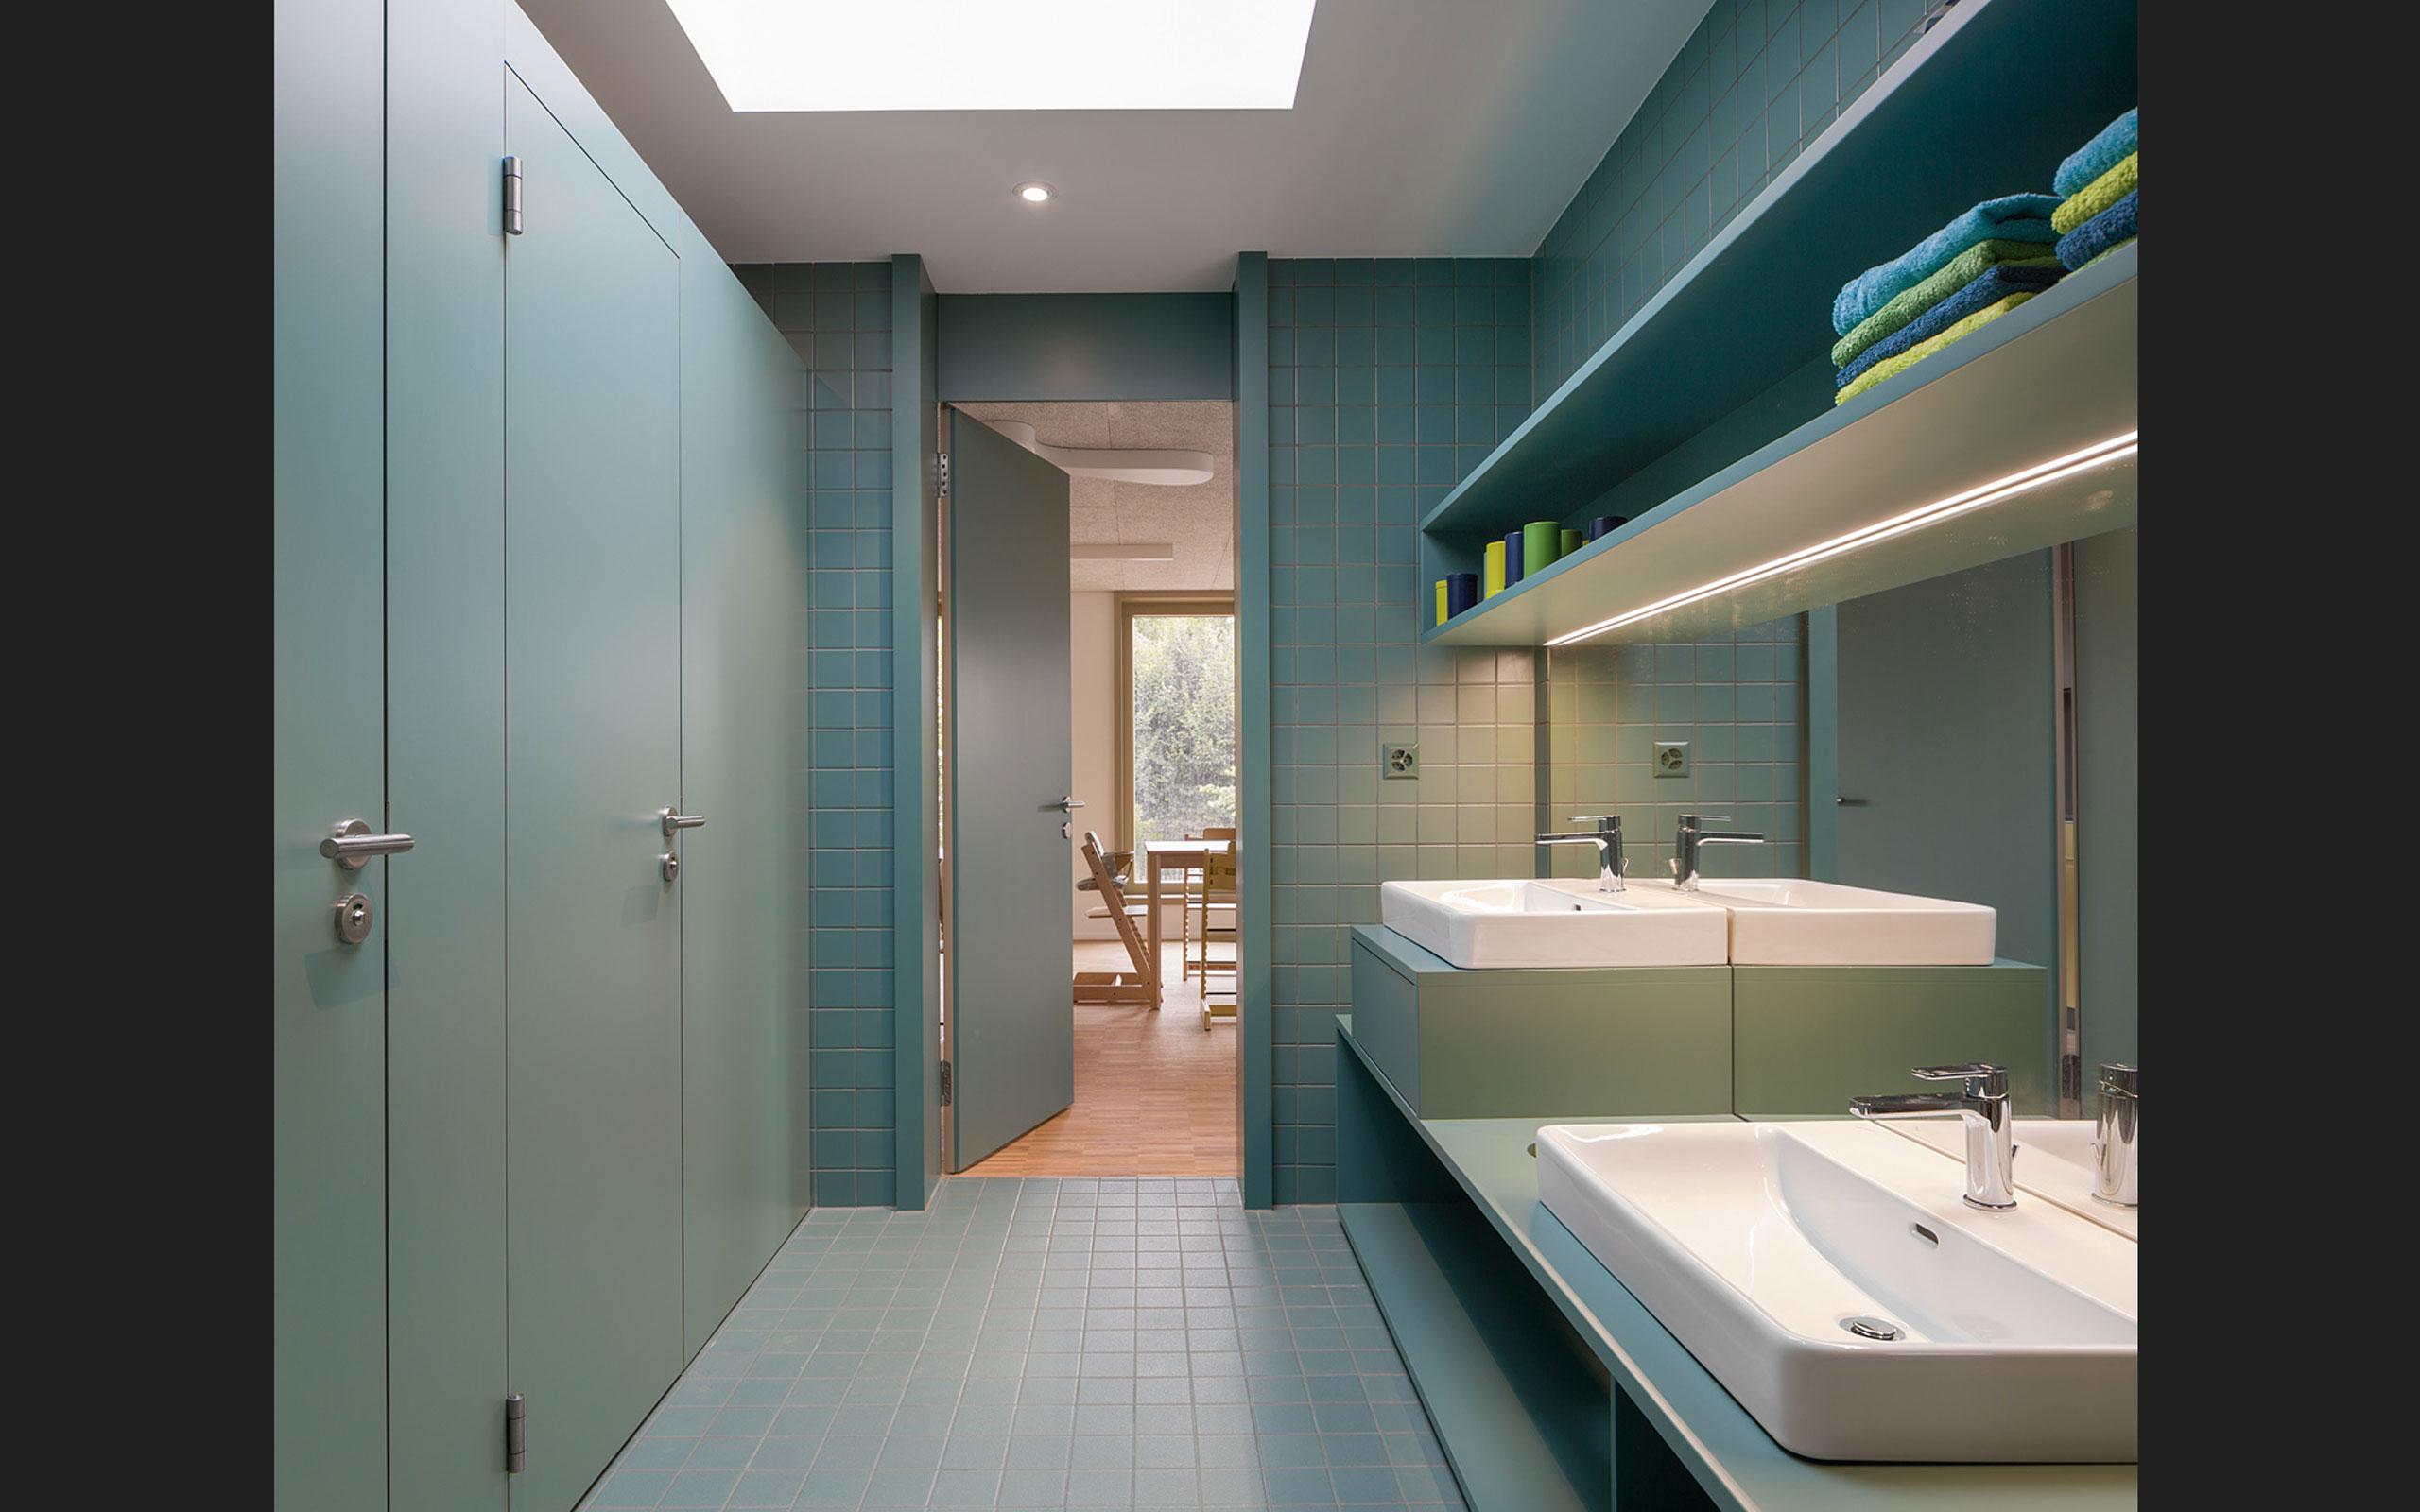 Architektur: tzarch.ch, Kita Thun